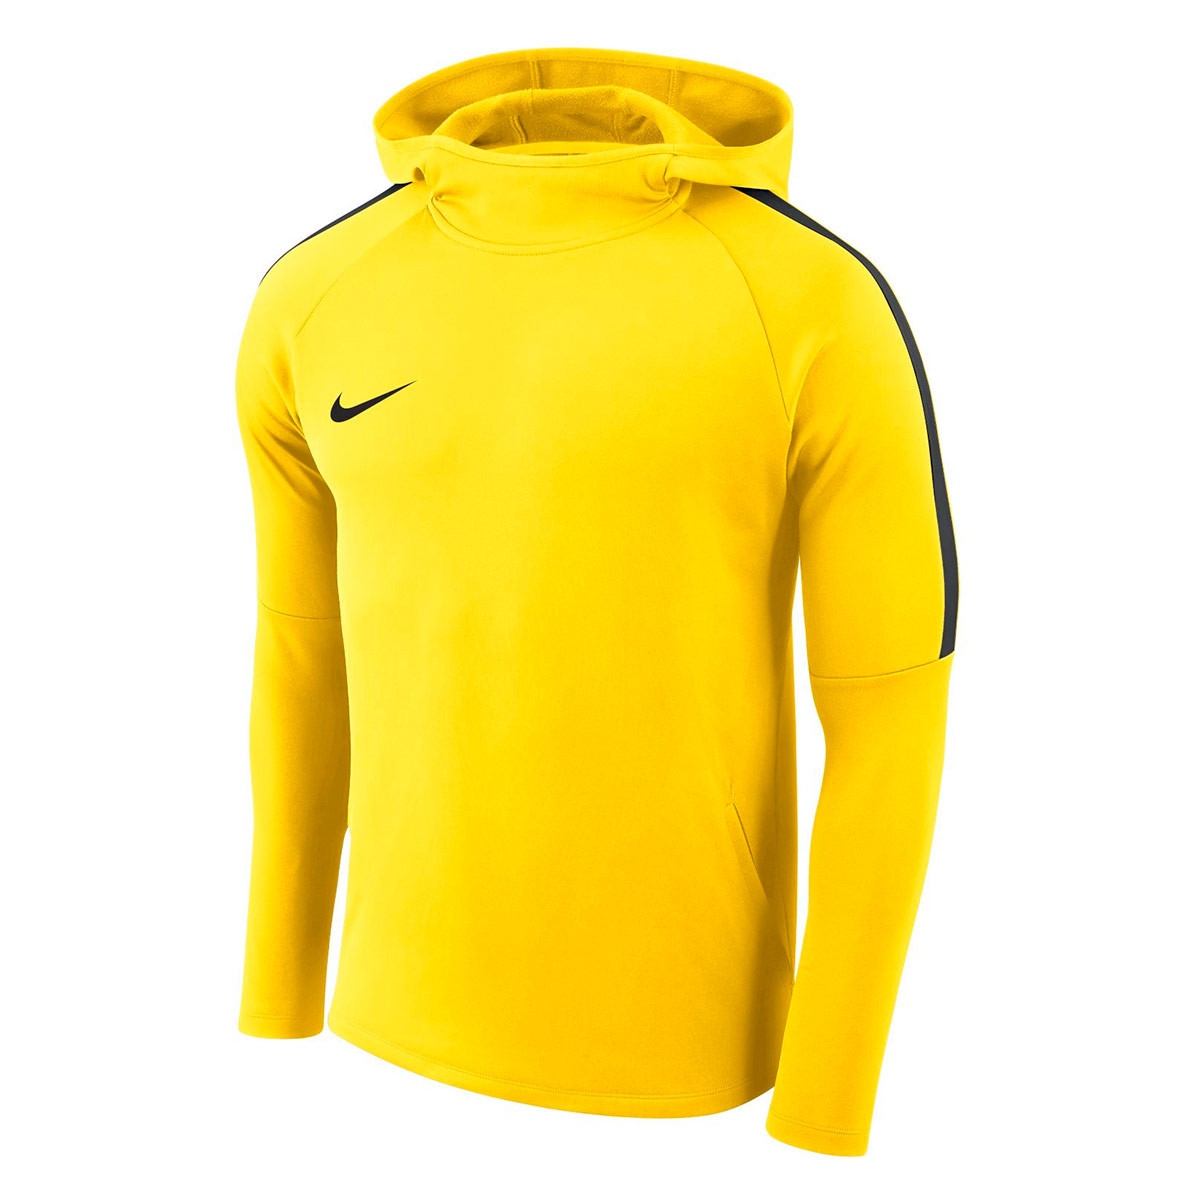 4a77d7089 Sweatshirt Nike Kids Academy 18 Hoodie Tour yellow-Anthracite-Black ...